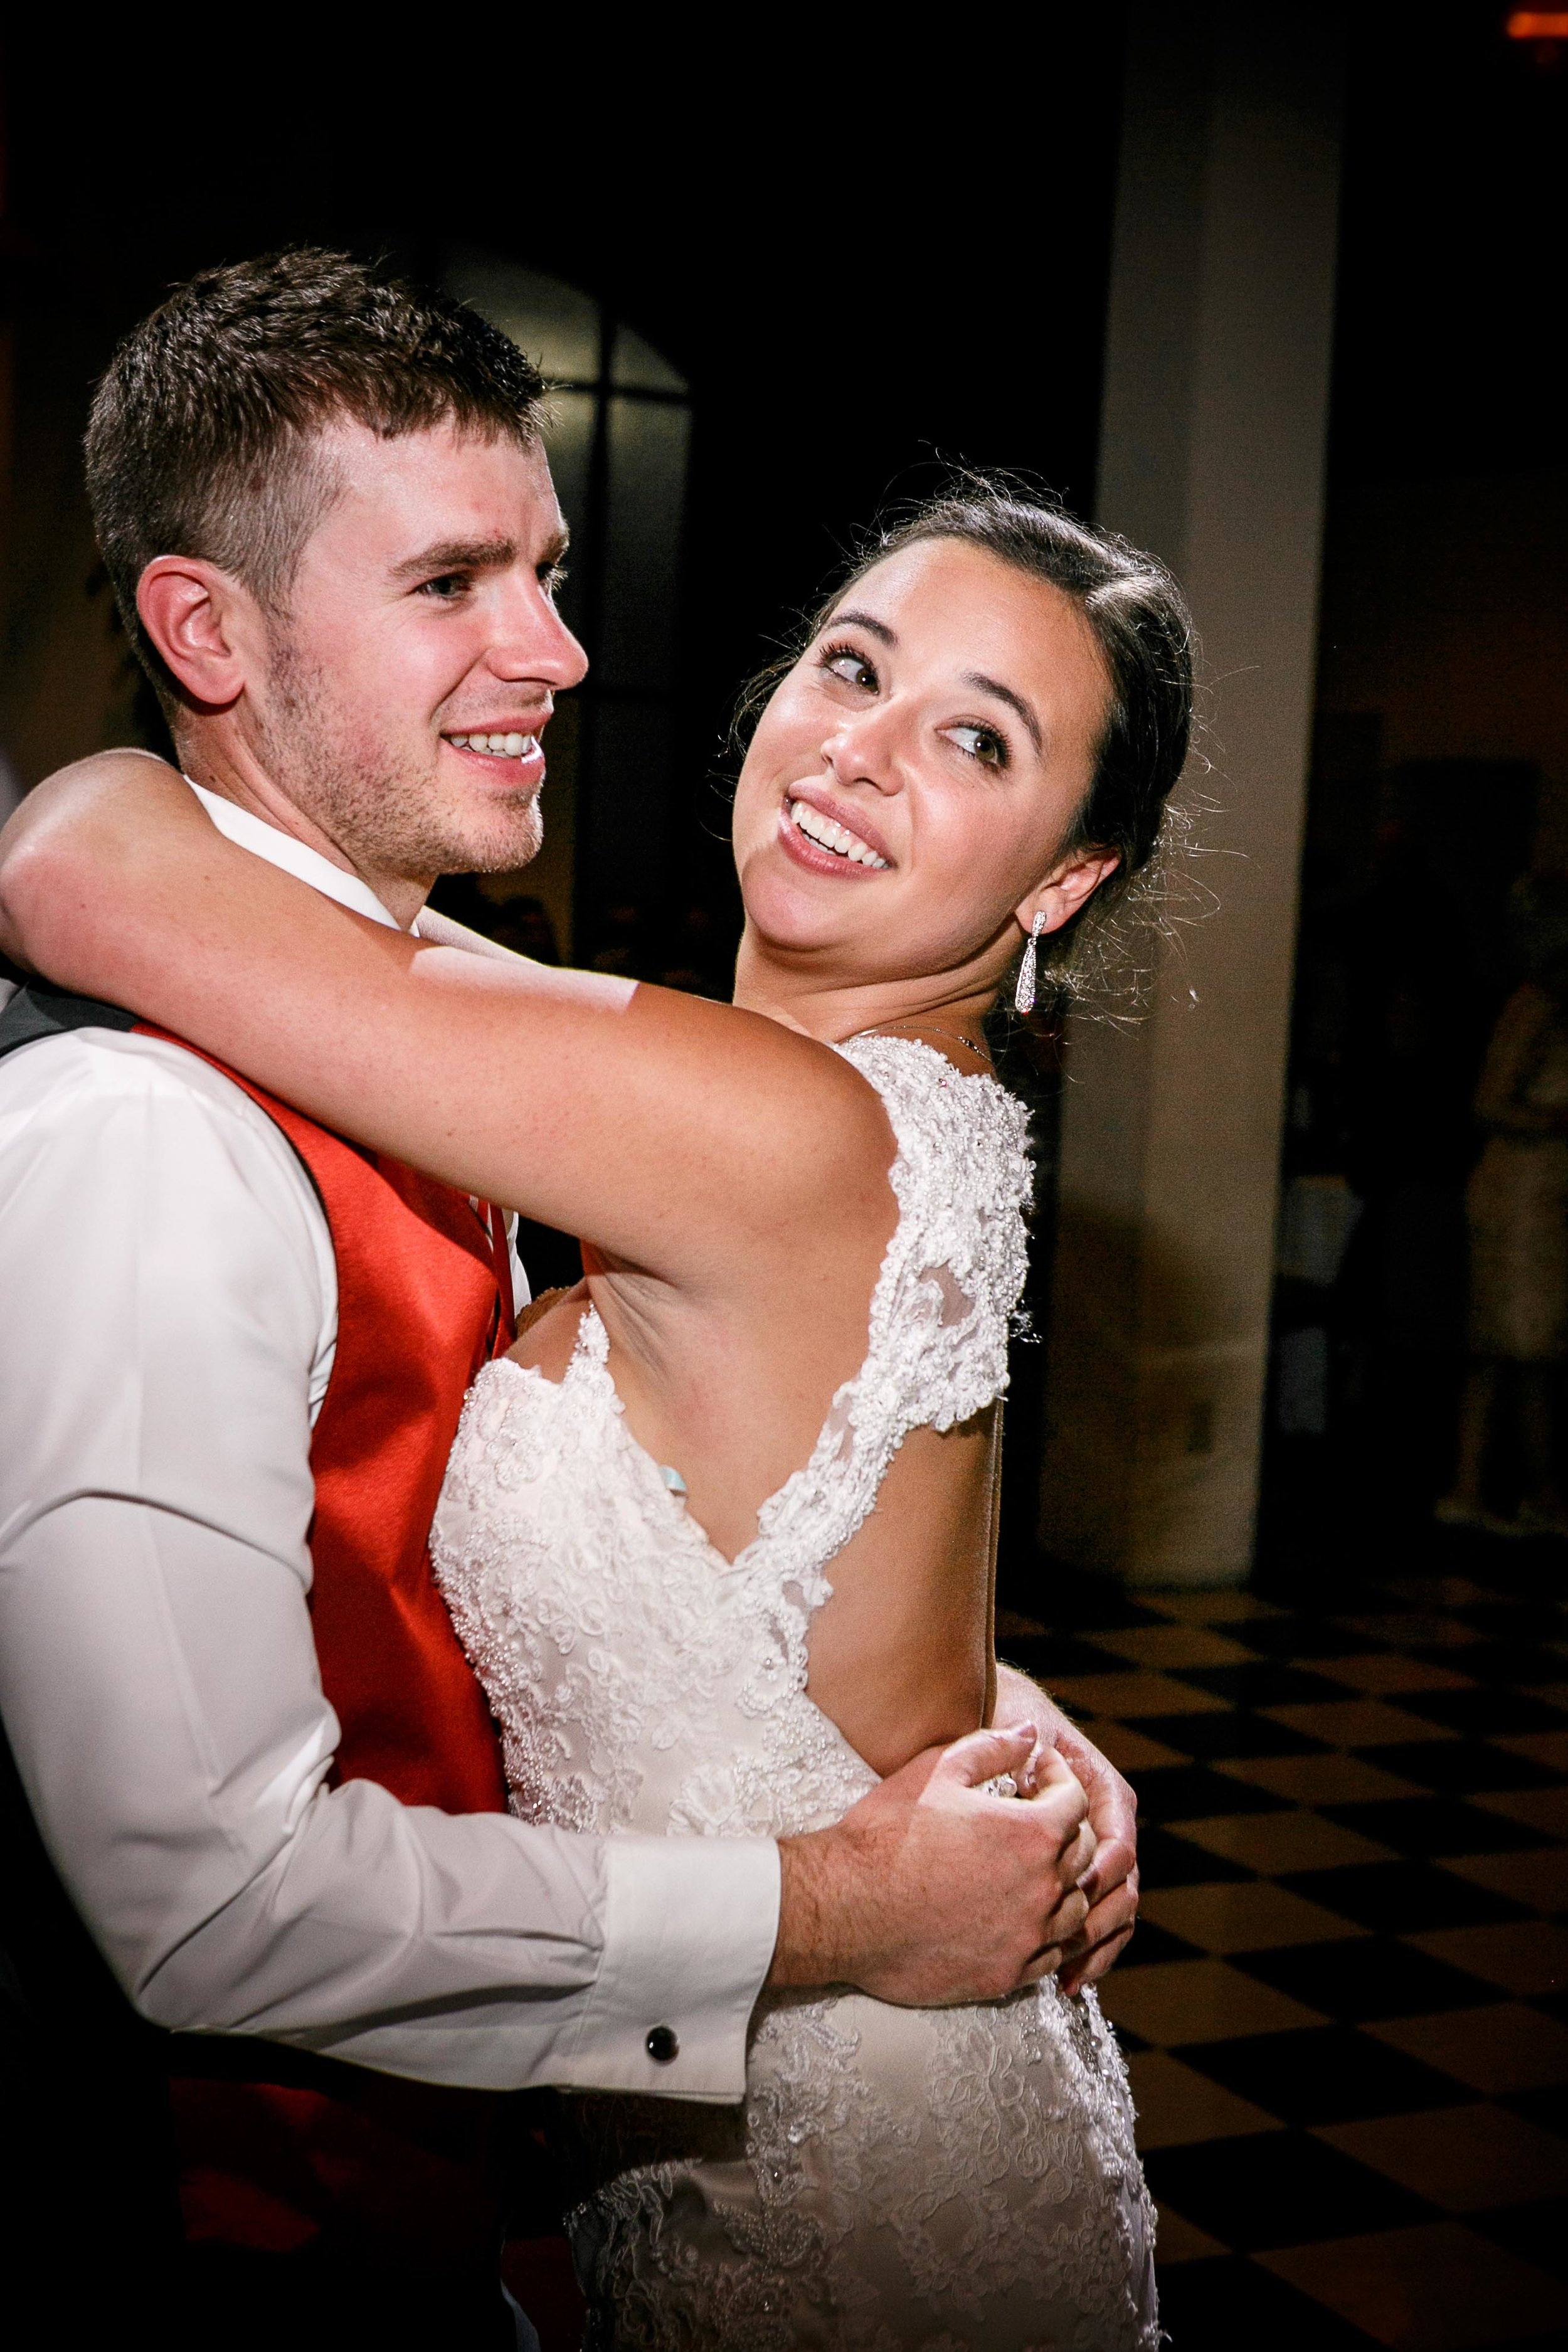 wedding photography, wedding photographer, Louisville wedding photography, Louisville, New Albany, Jeffersonville, Clarksville, professional photographer, photojournalism, full day wedding photography, Kye's.